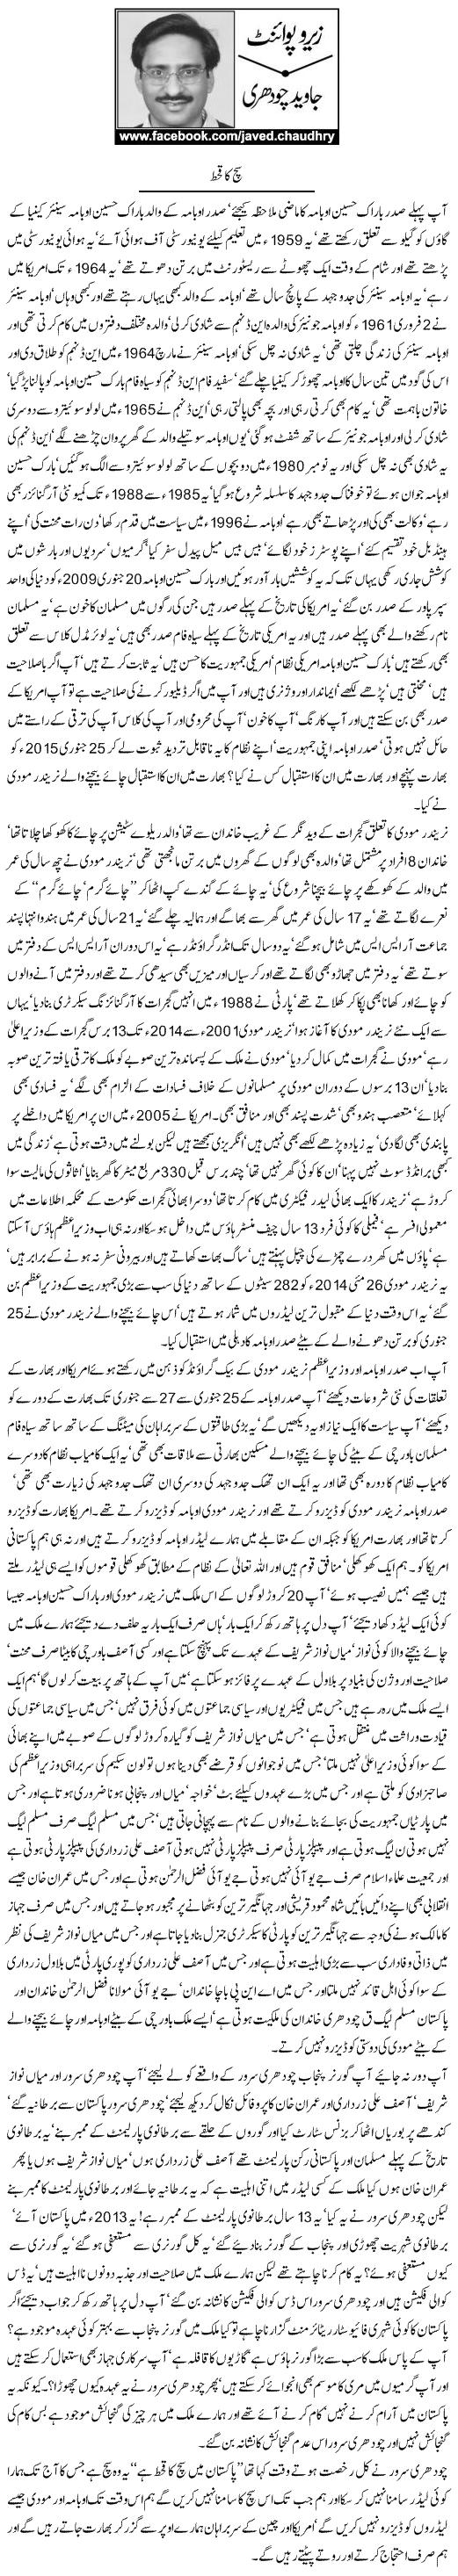 Such Ka Qeht - Zero Point By Javed Chaudhry - Pakfunny